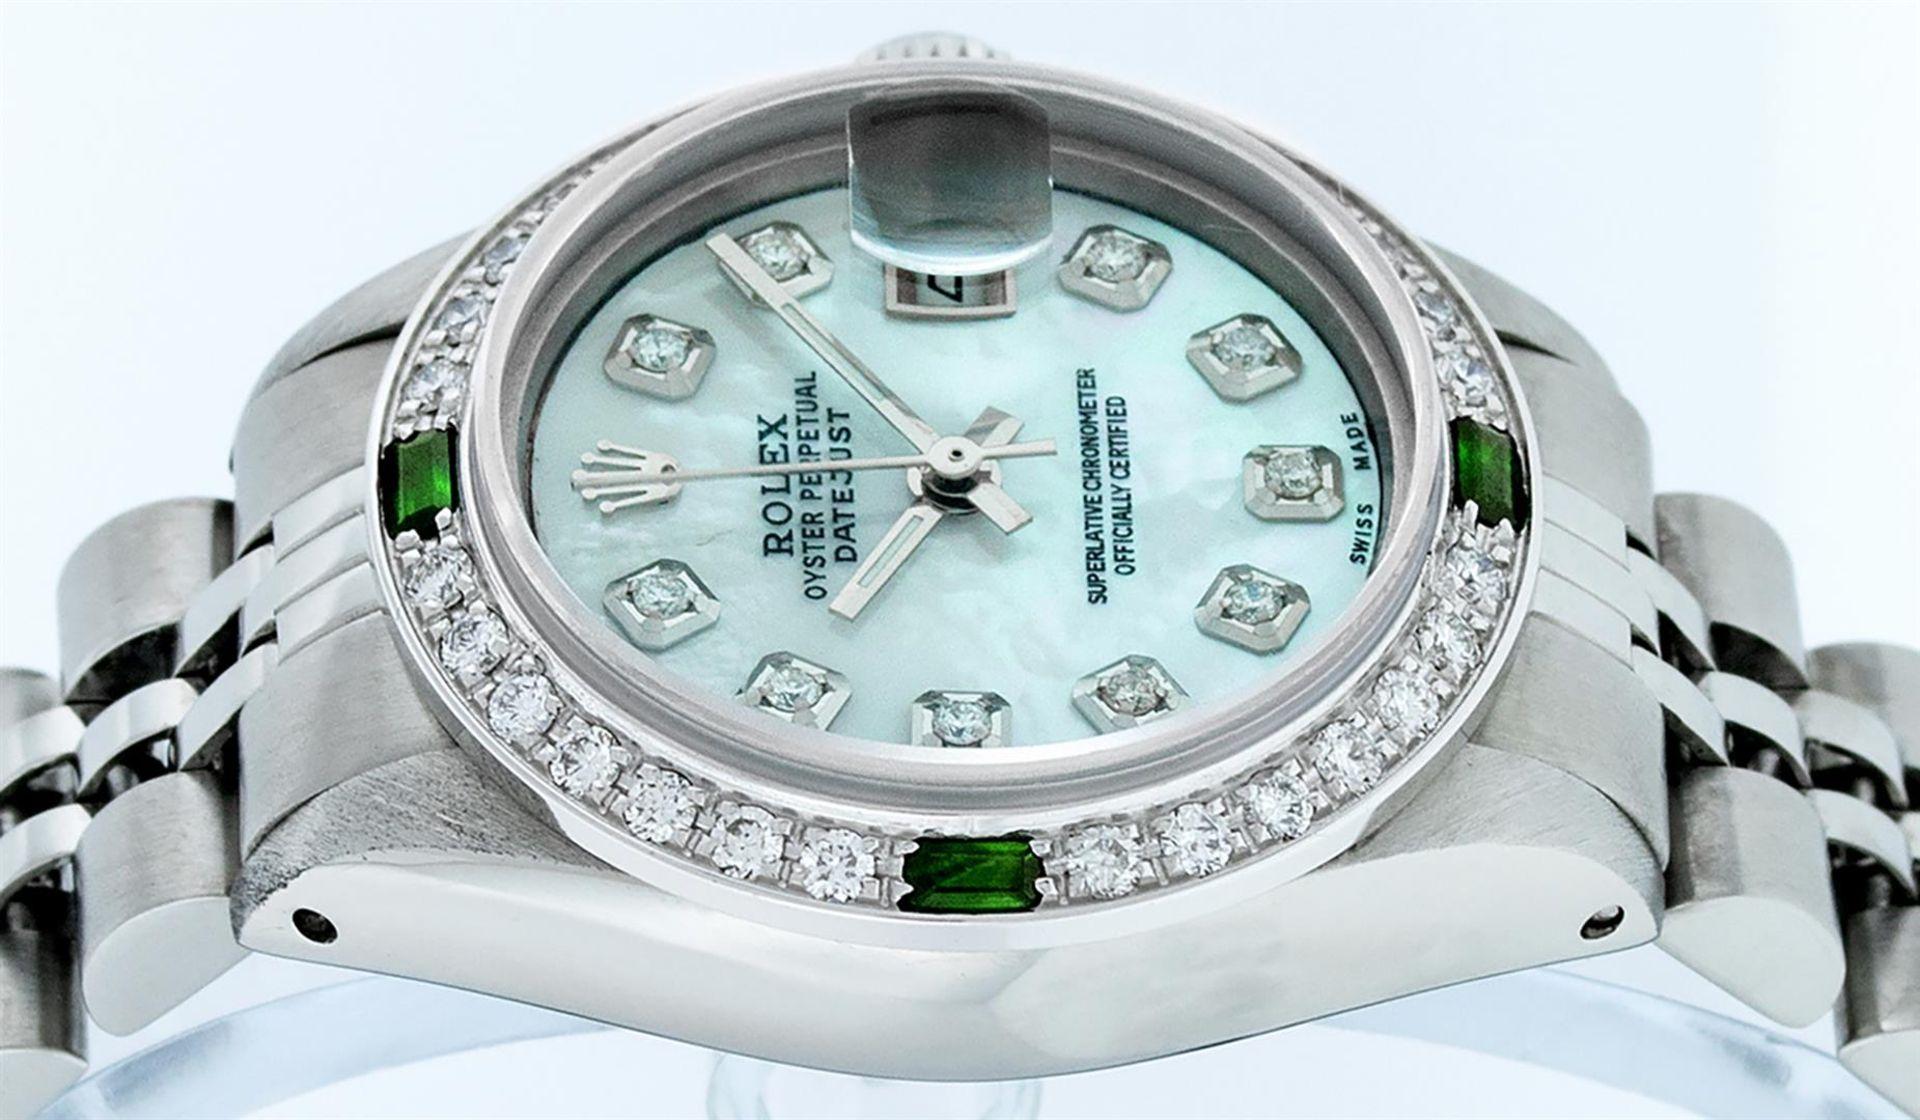 Rolex Ladies Stainless Steel Blue MOP Diamond & Emerald Datejust Wristwatch - Image 3 of 9